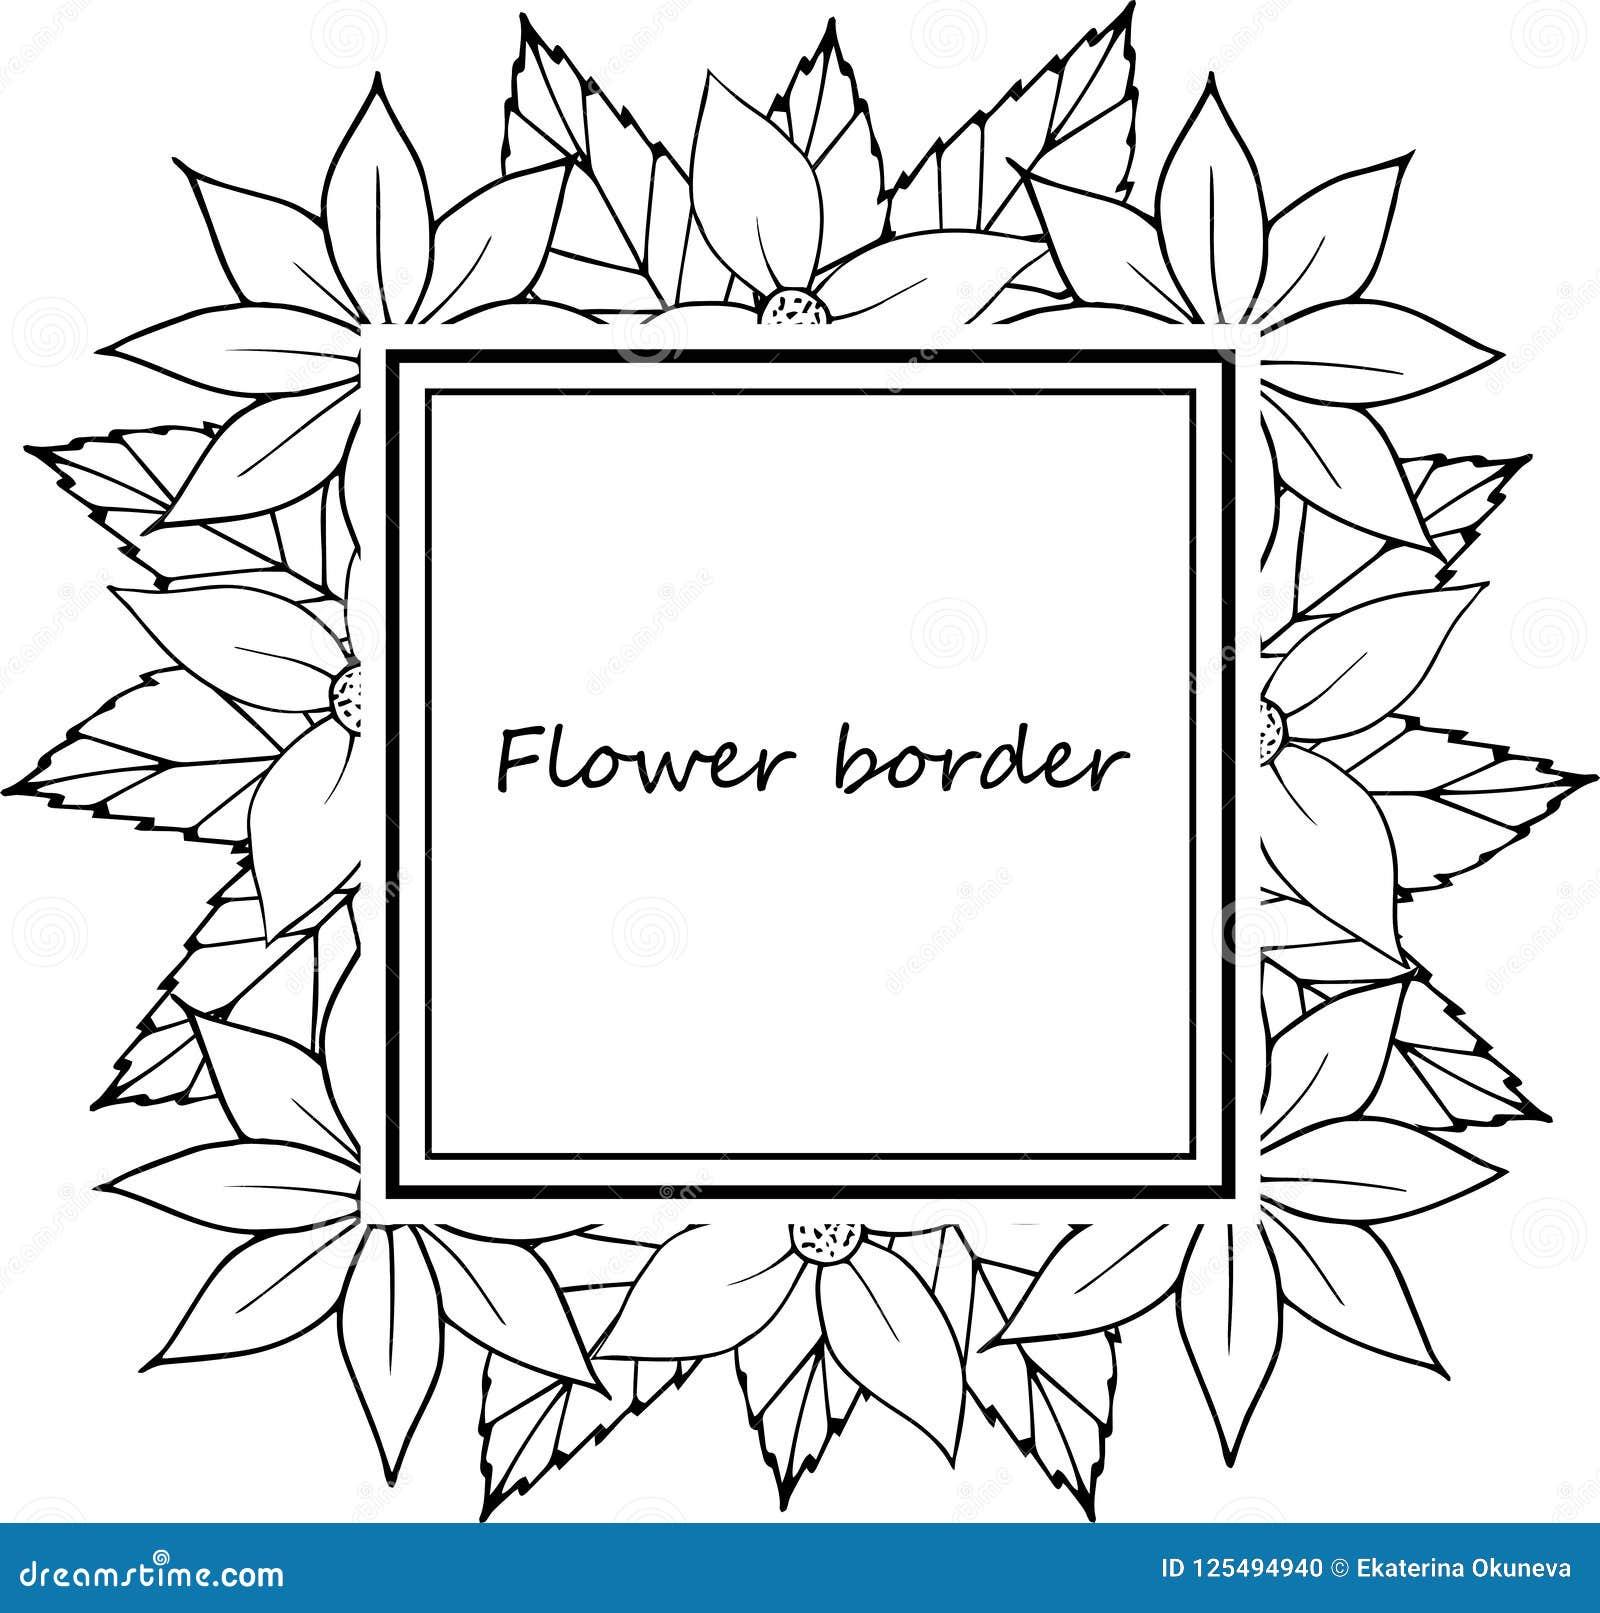 flower vector drawing frame hand drawn floral wedding invitation